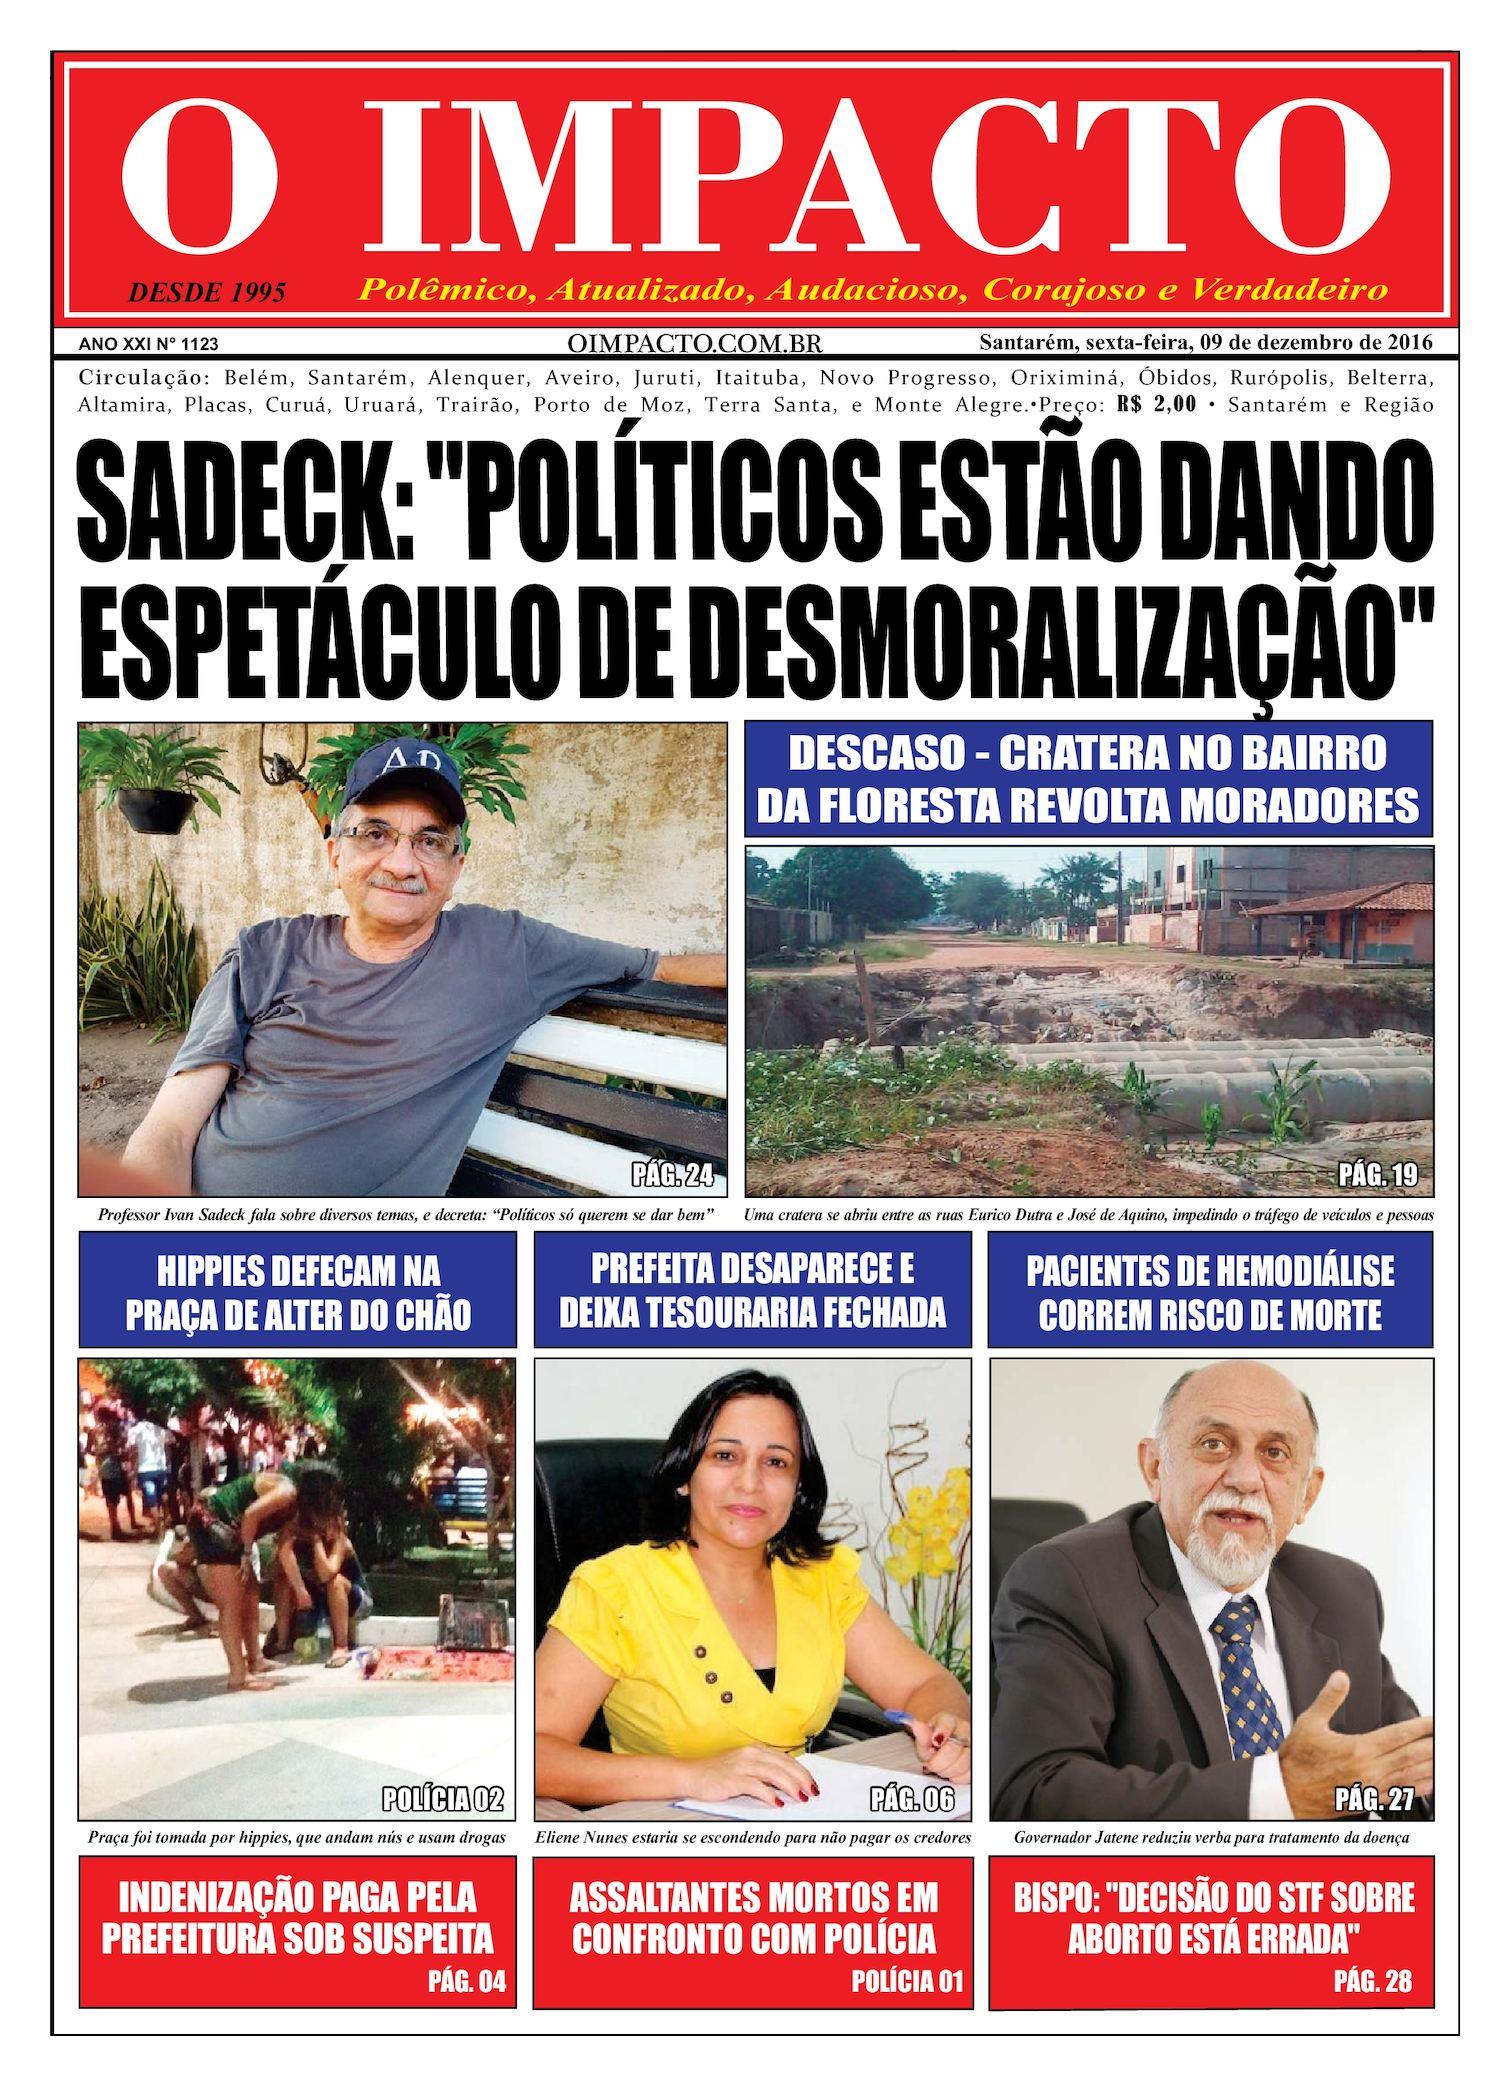 Calaméo - Jornal O Impacto Ed. 1123 7fde466b6efe7